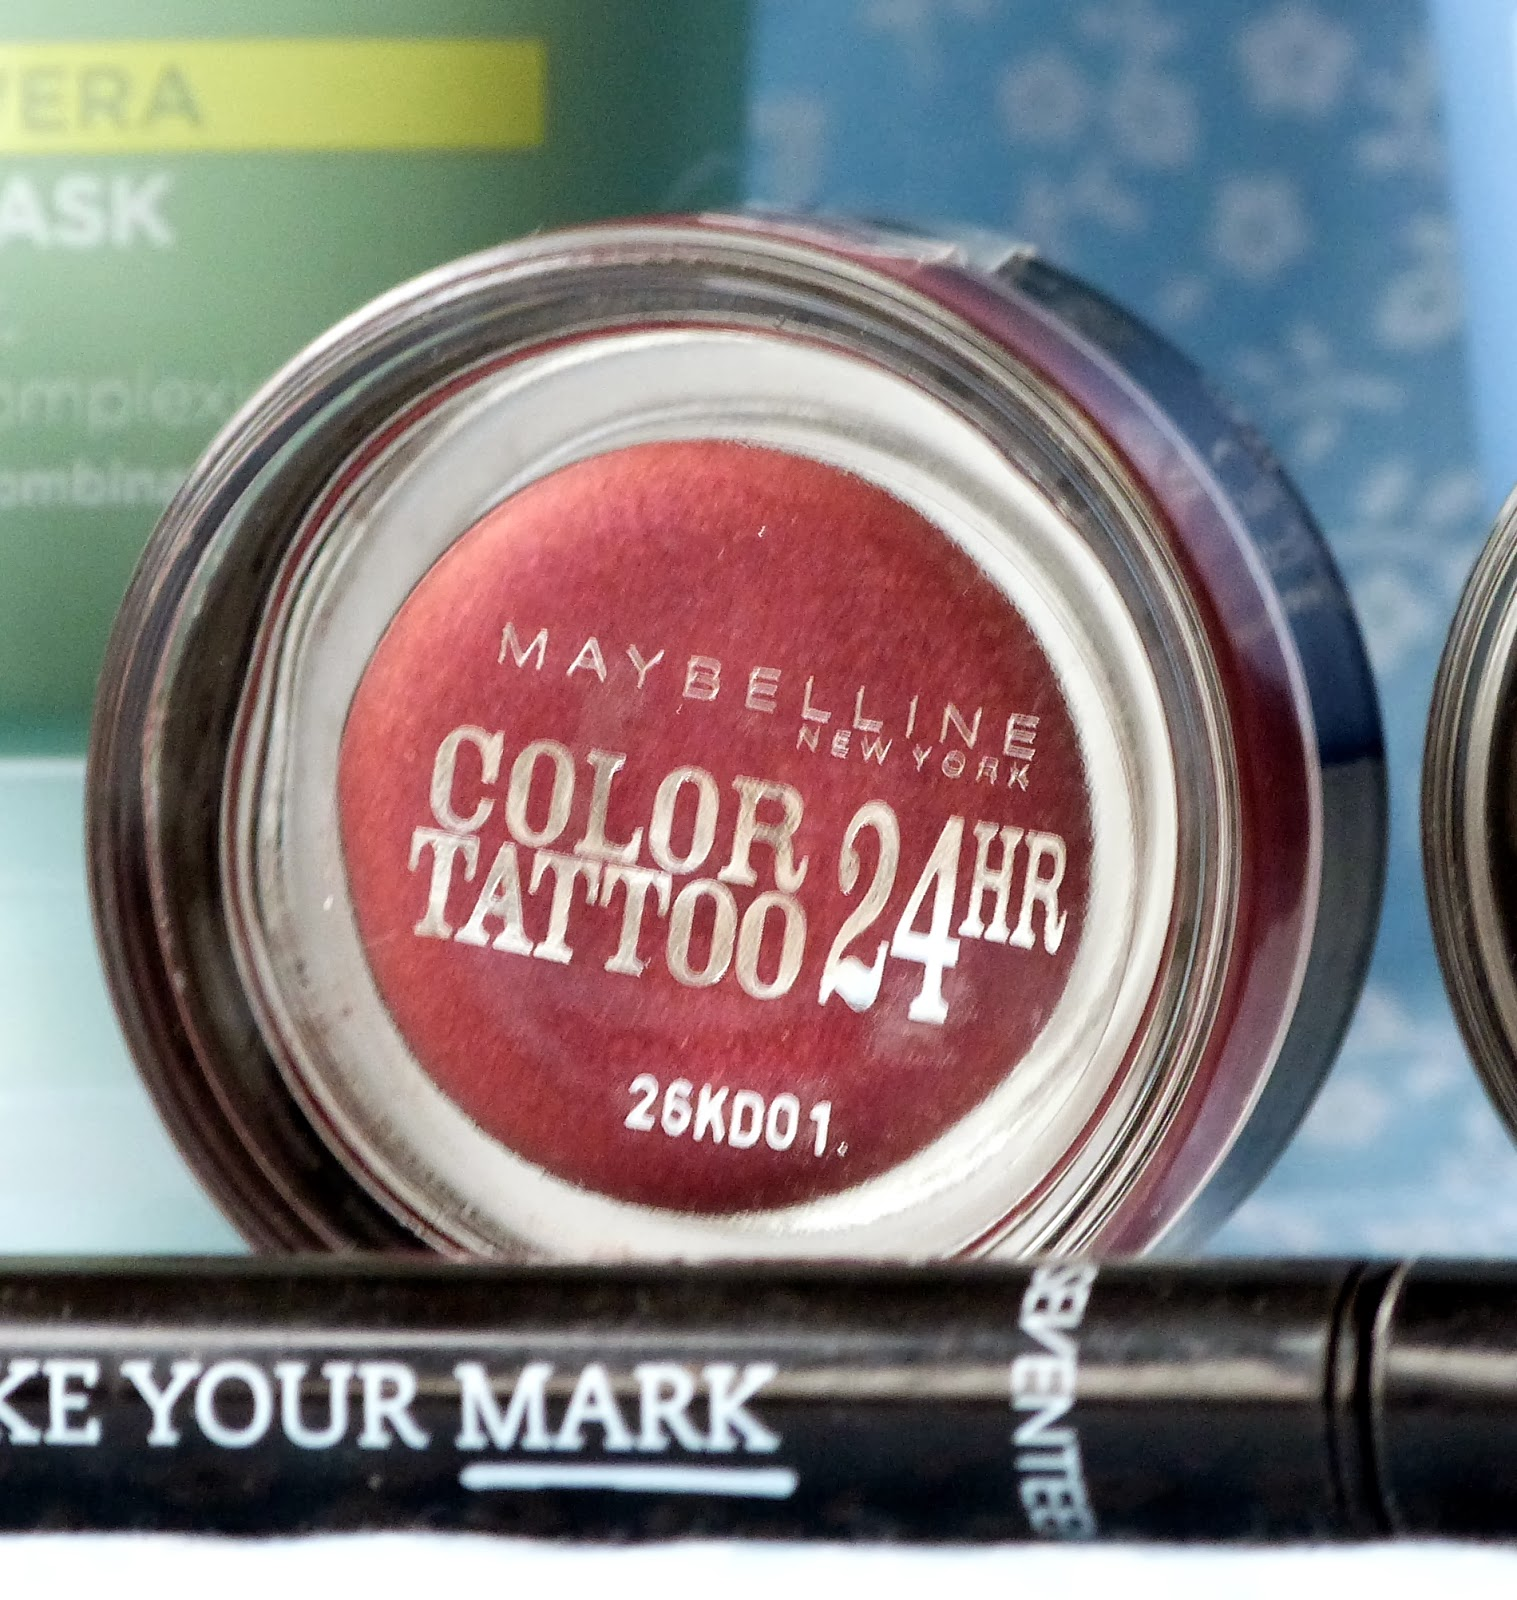 Maybelline Colour Tattoo in Metallic Pomegranate